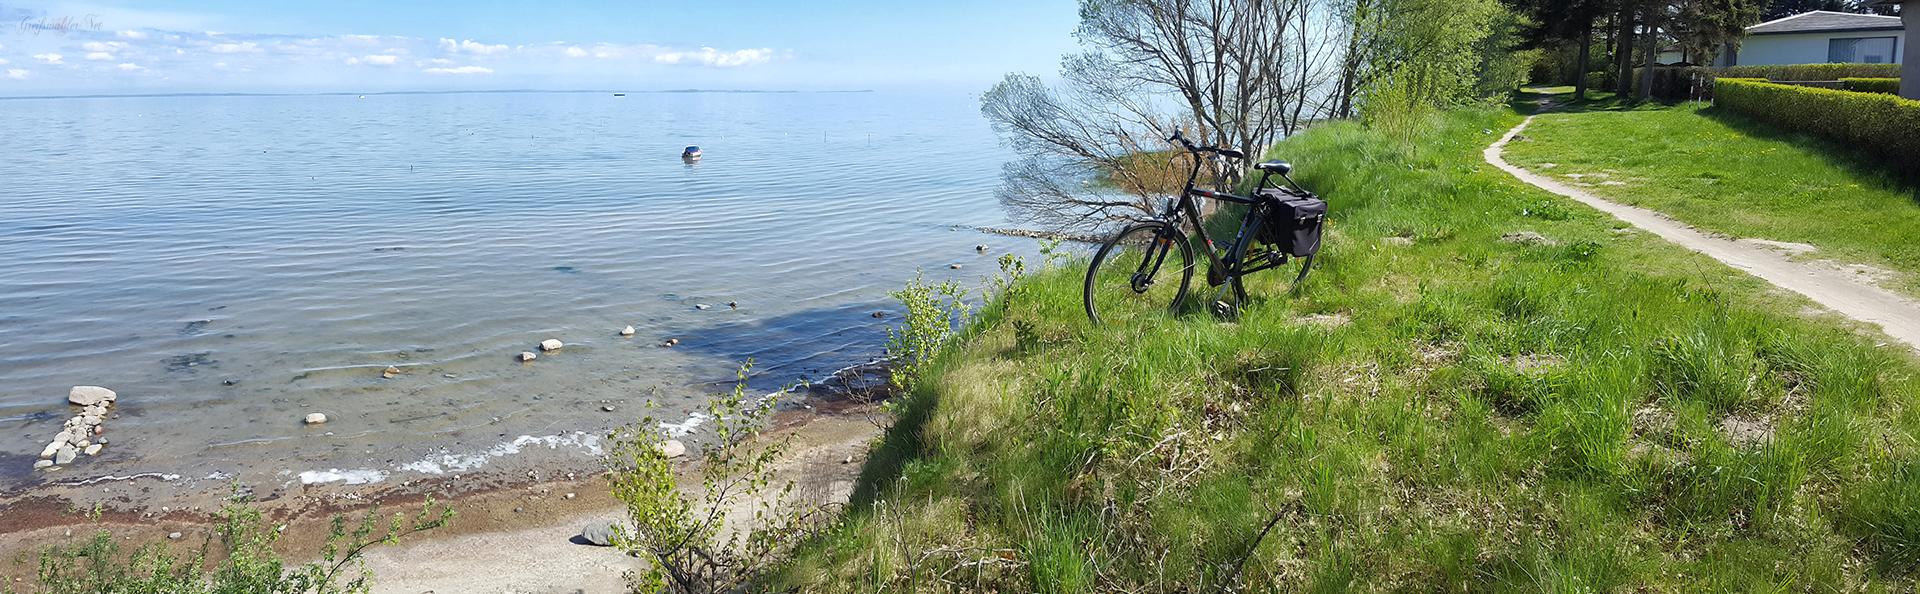 Fahrradtour am Strand bei Loissin